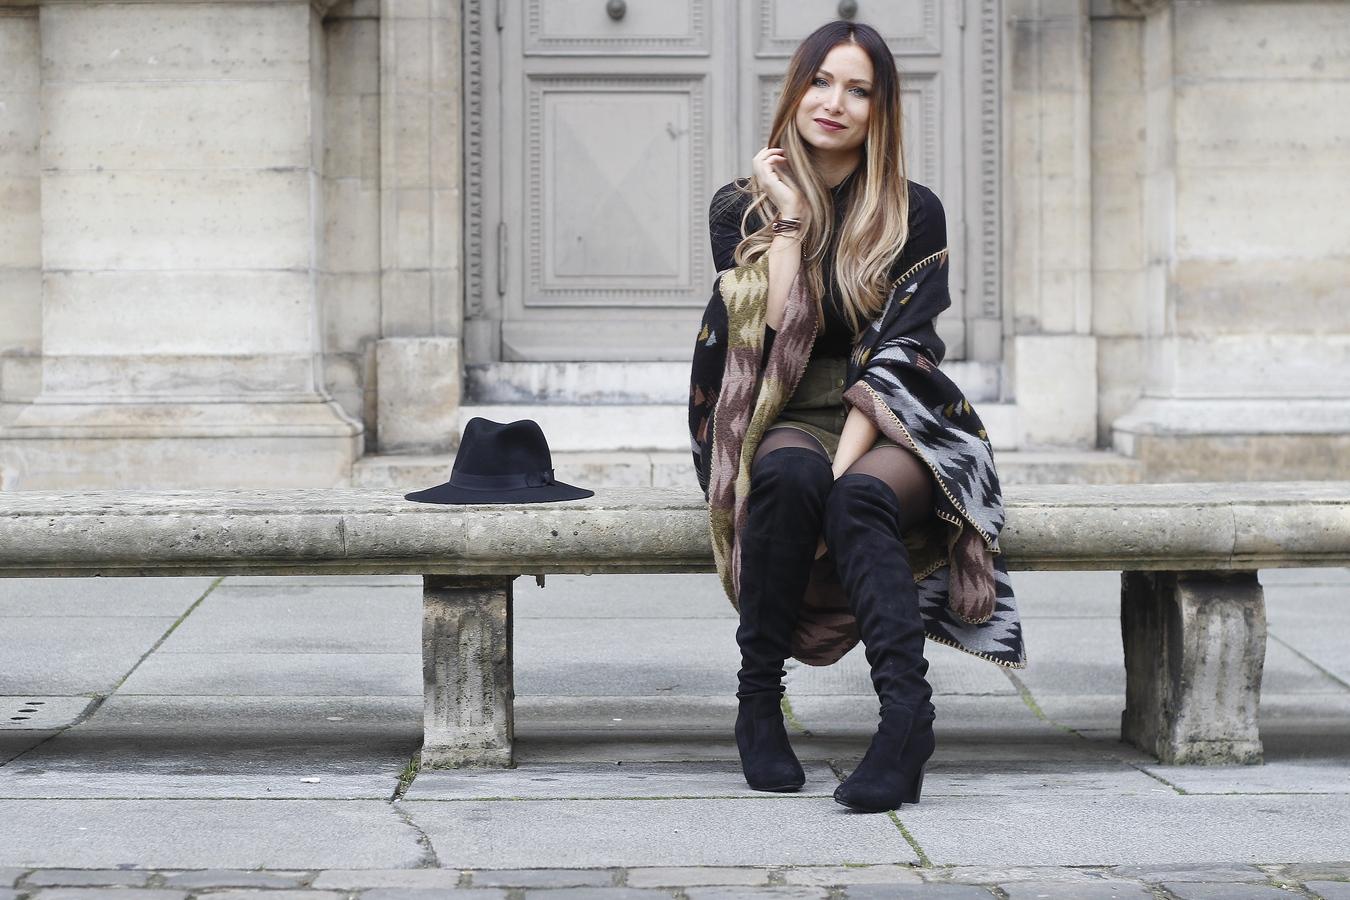 Blog mode femme Paris - Du style, Madame - Streetstyle - look style - seventies - boheme